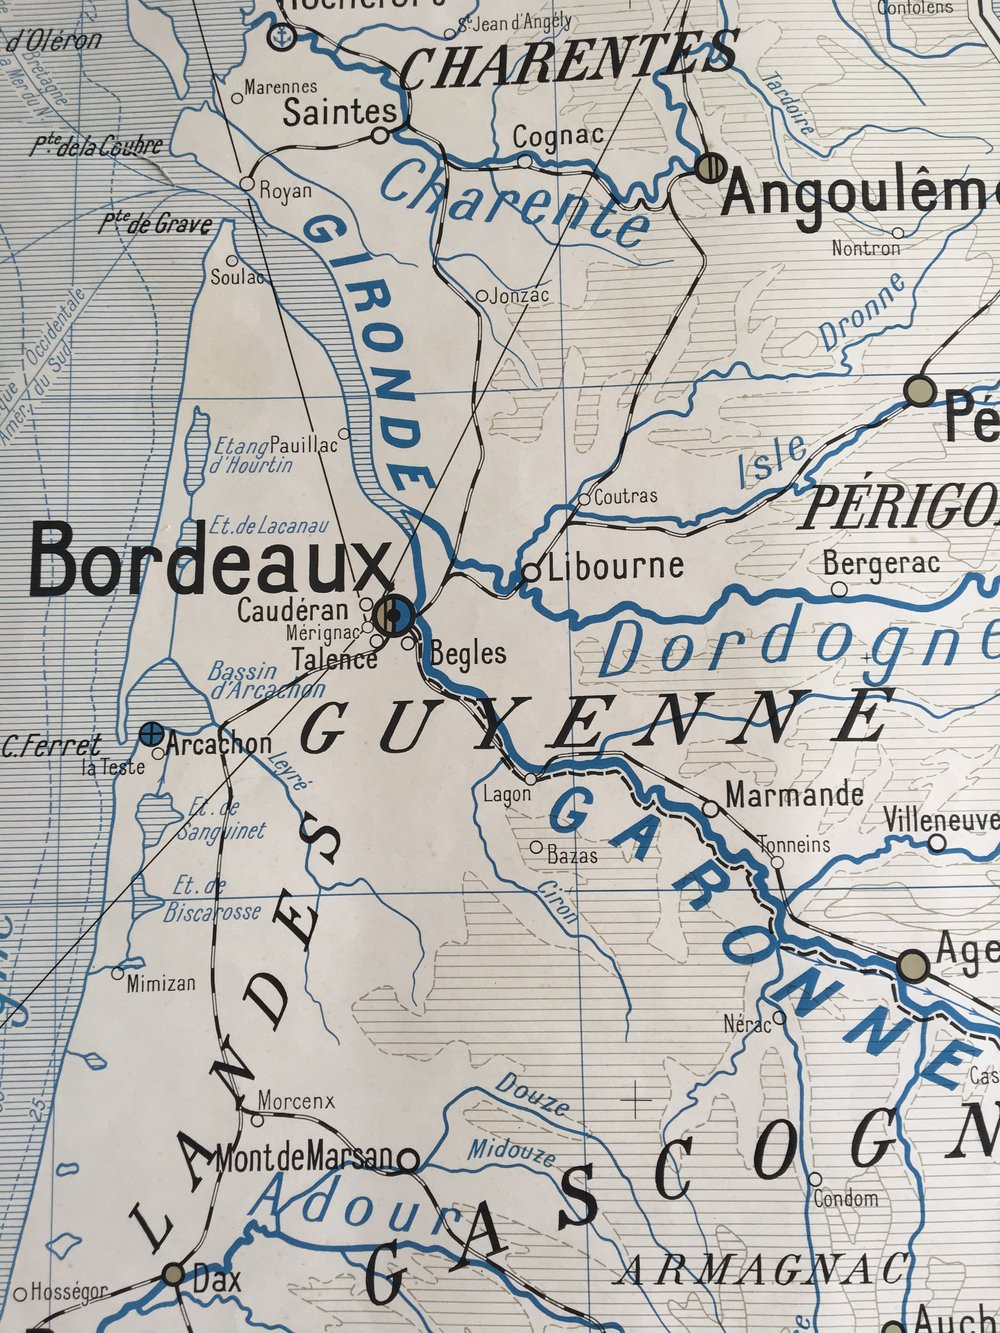 bordeaux map.JPG